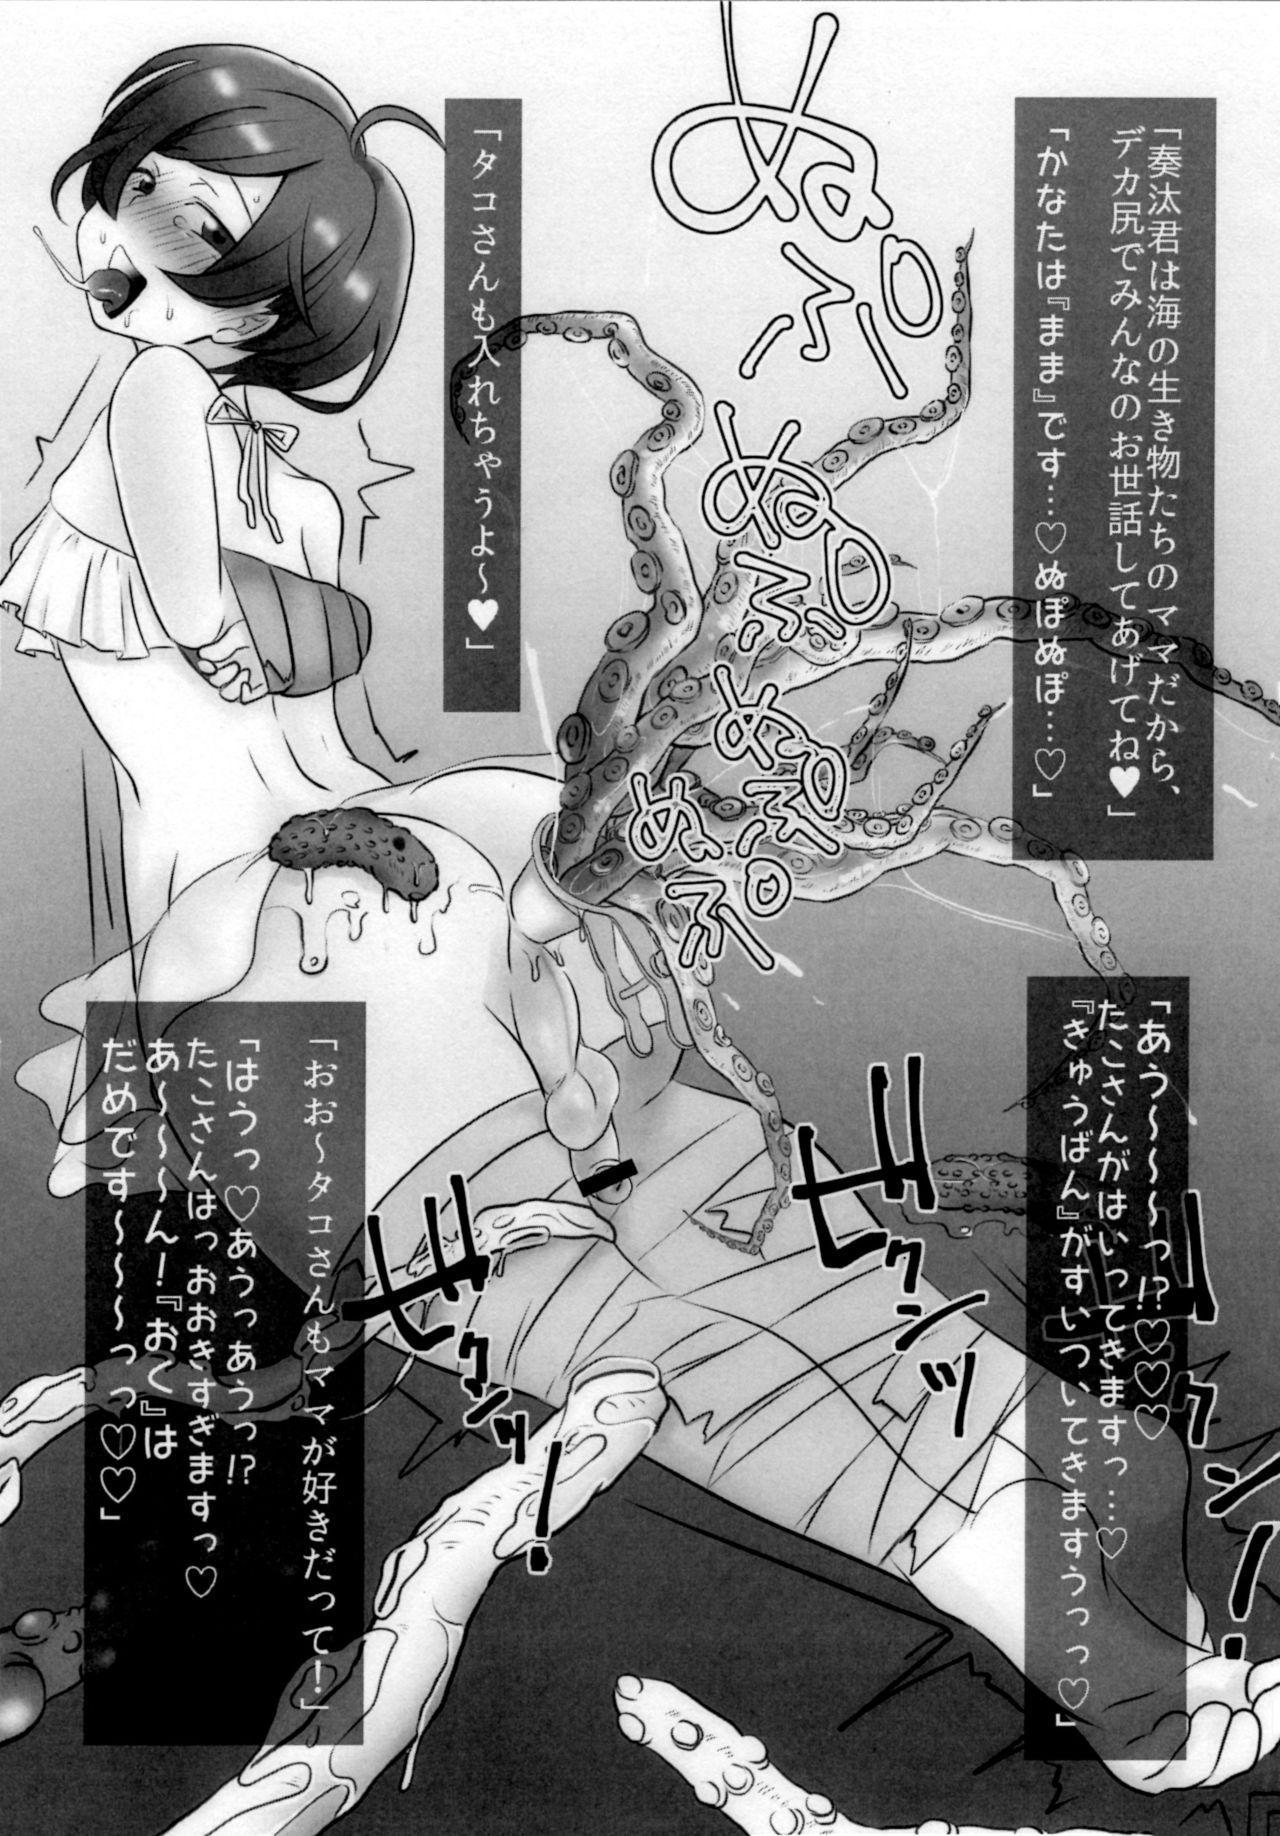 Yumenosaki Matomete Minna Saimin Kan 11